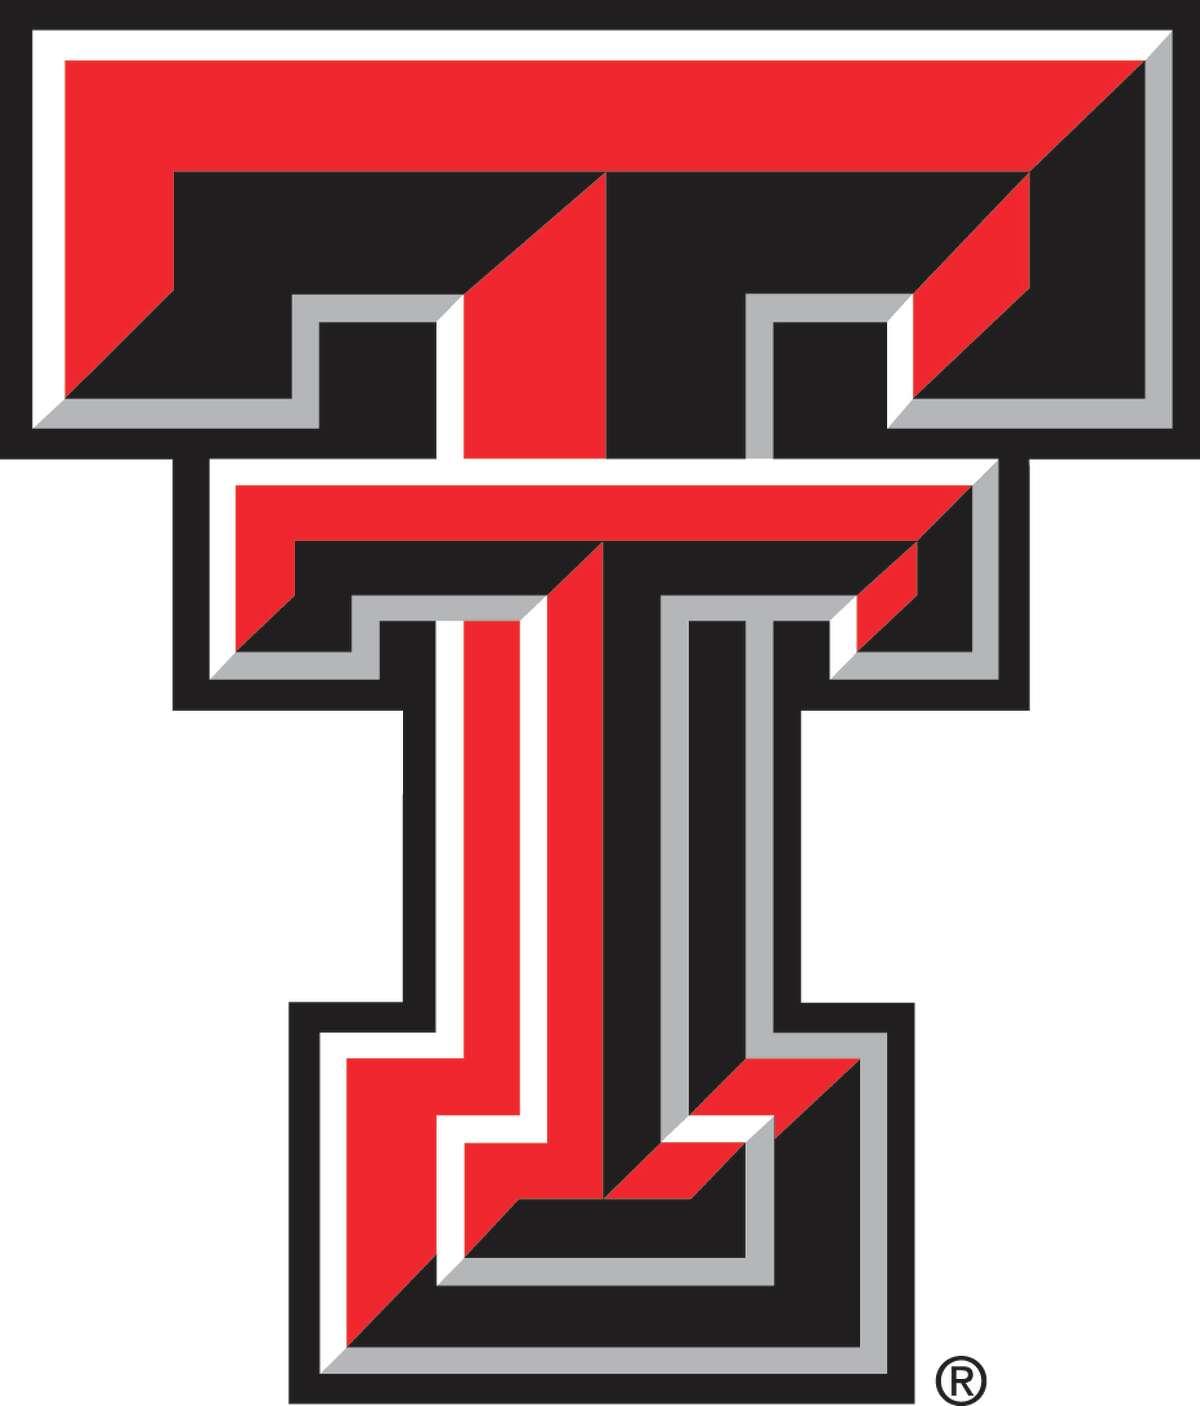 Texas Tech logo uploaded June 2021.